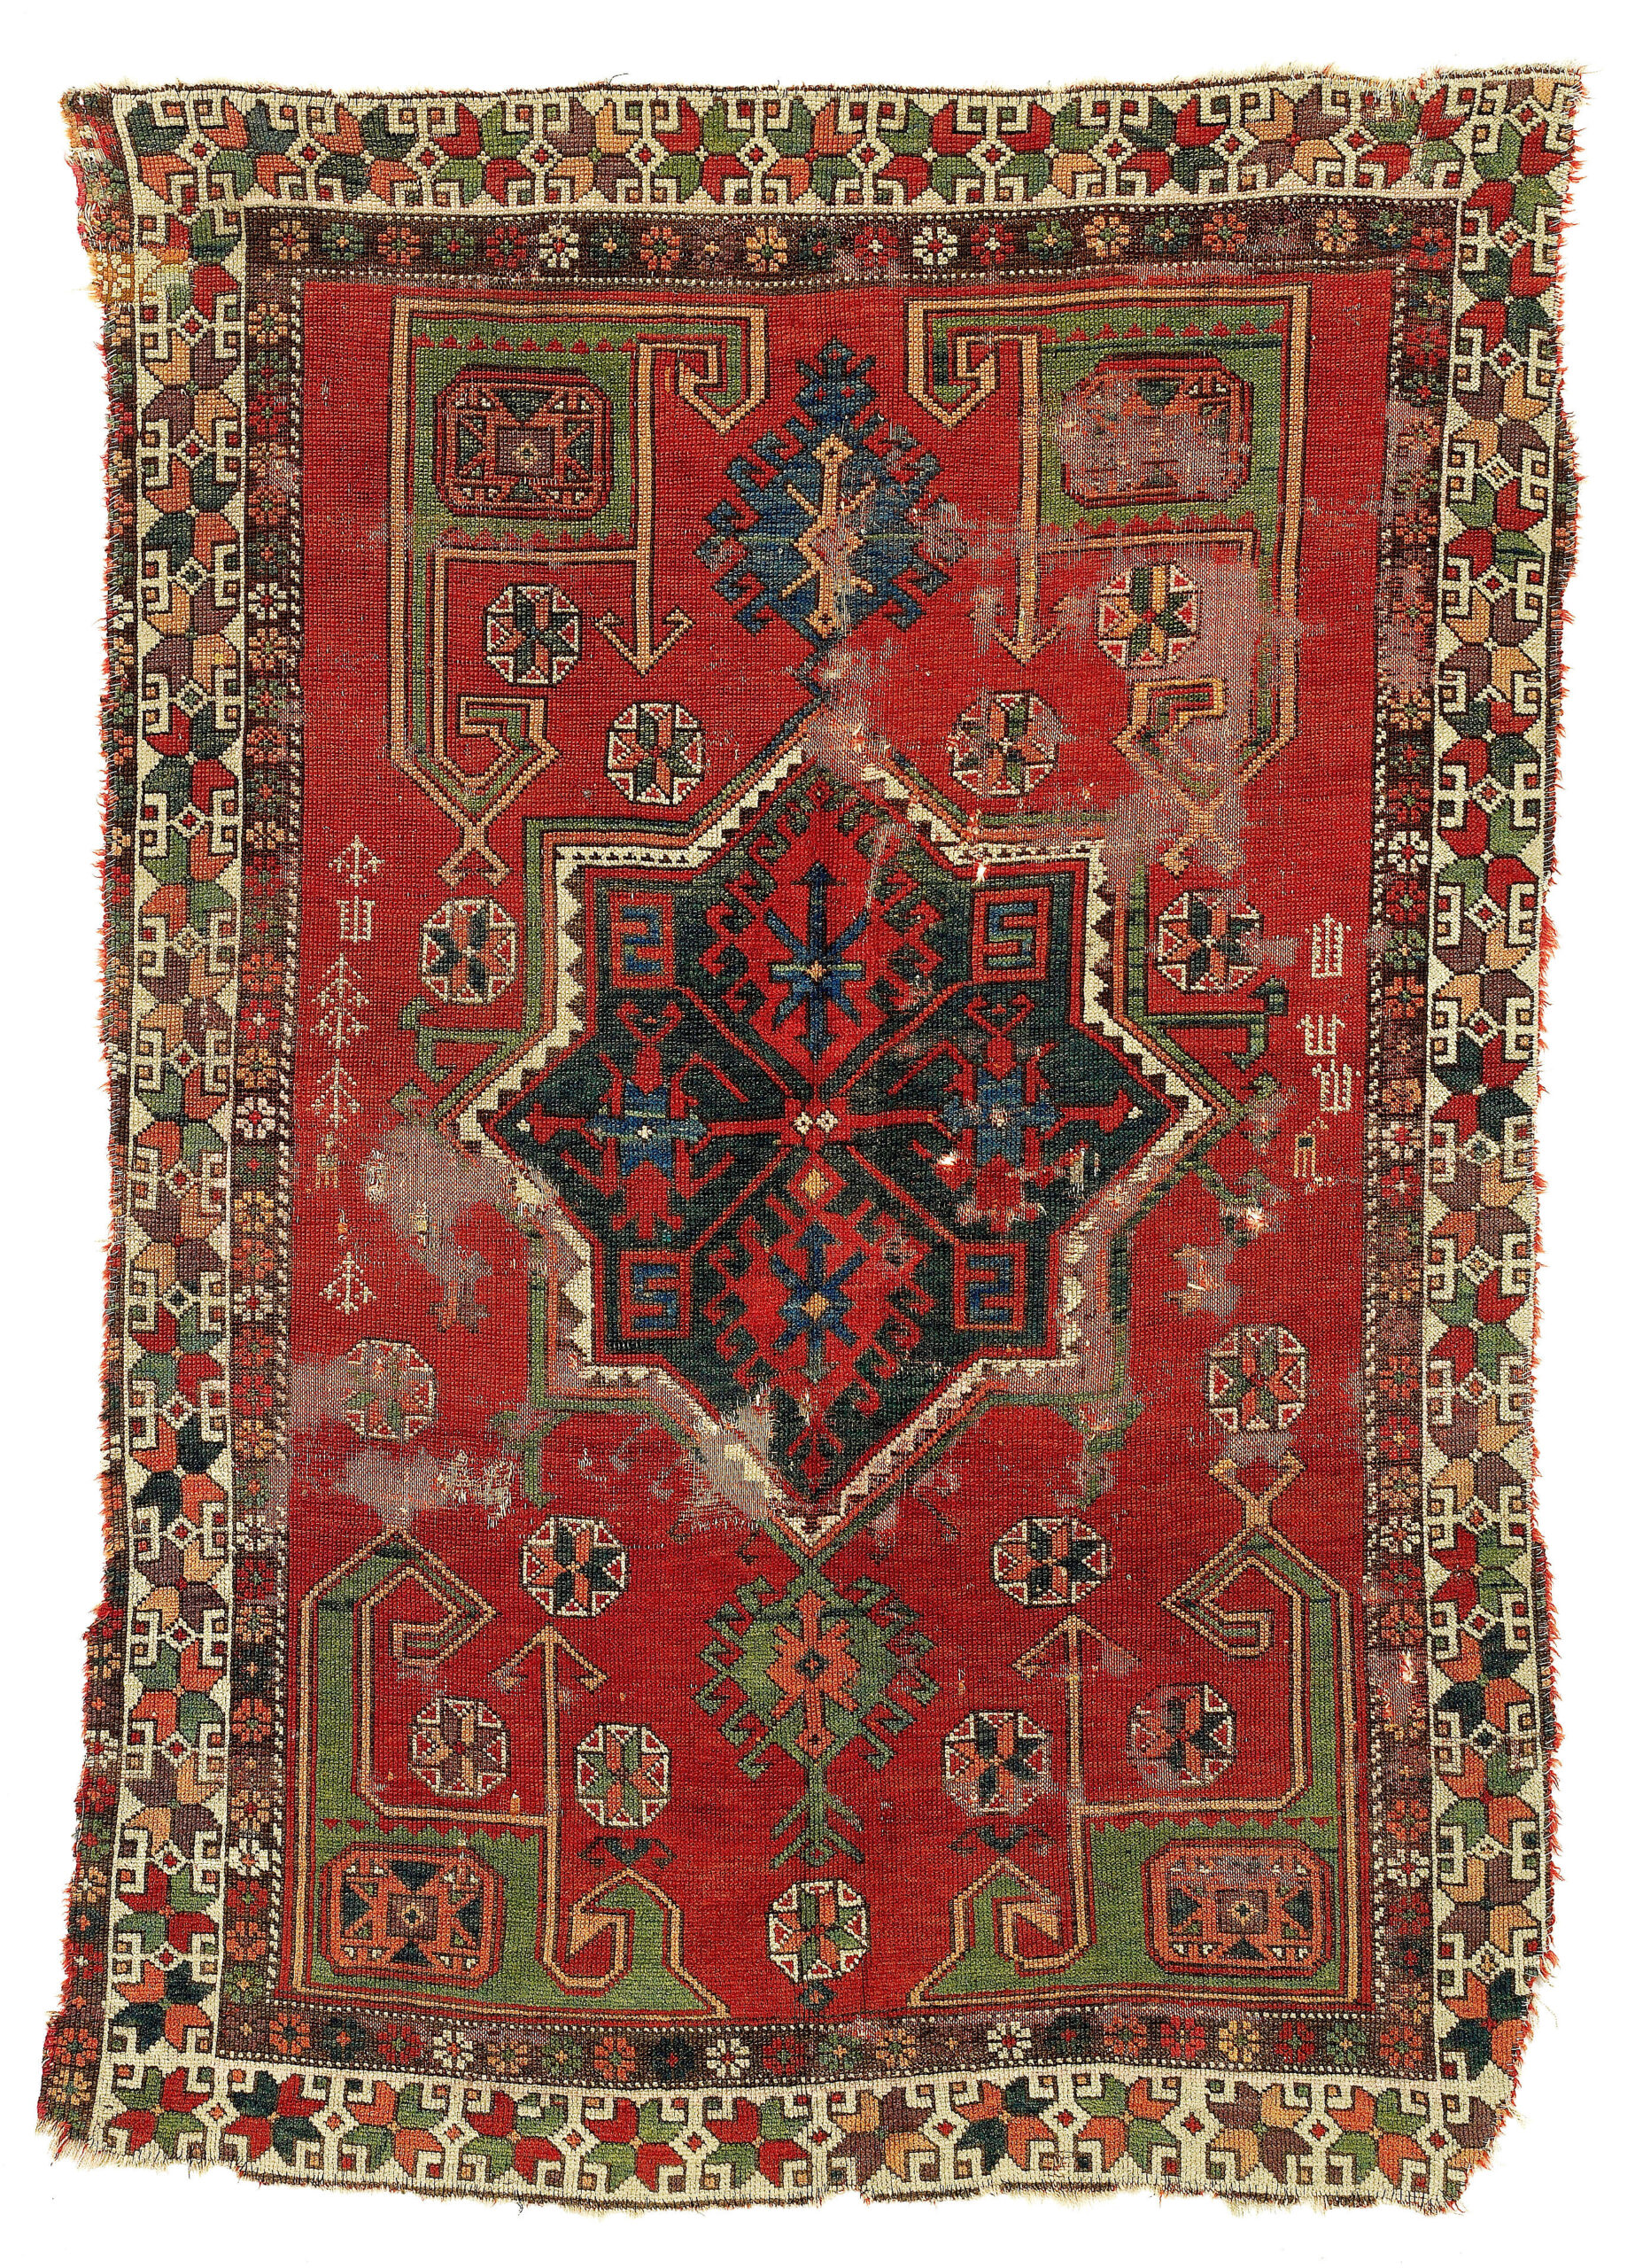 17th-18th entury carpet from Konya, Central Anatolia